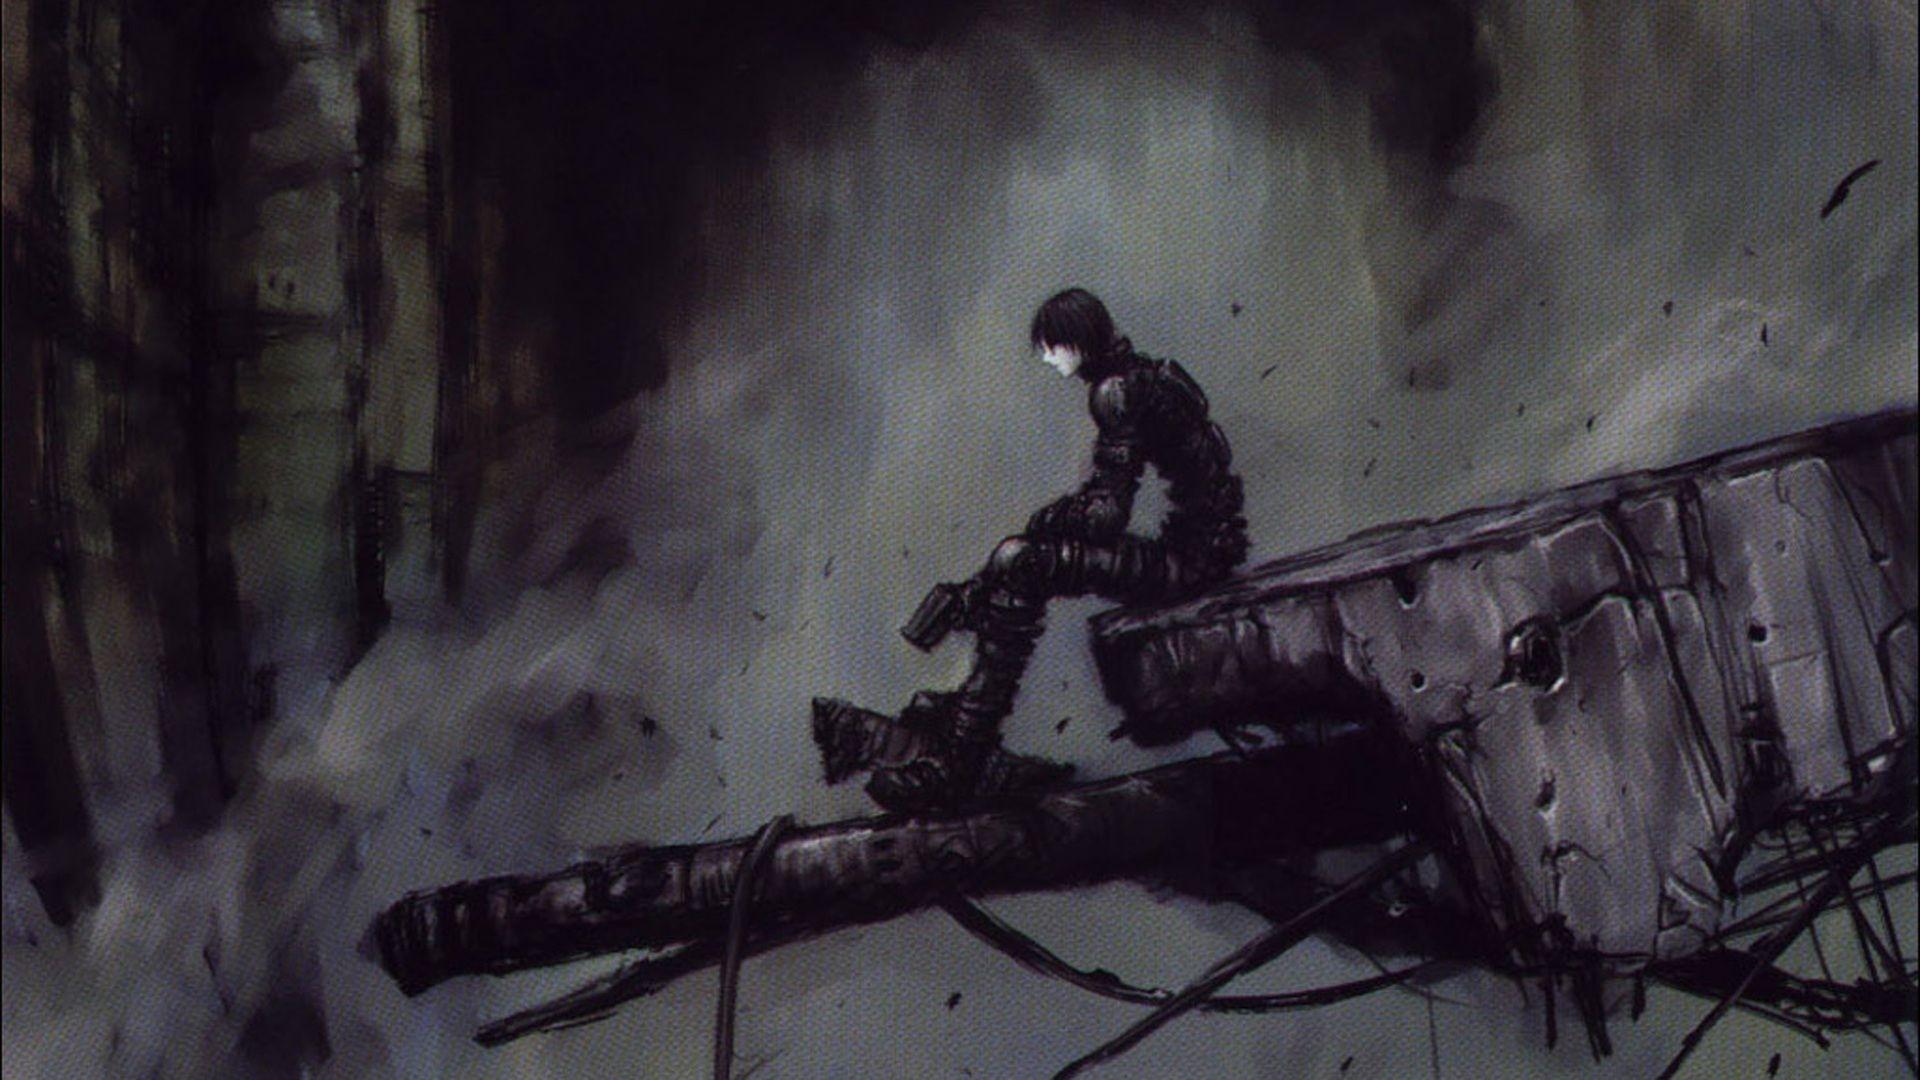 Anime Blame Dark Manga Anime Wallpaper Mononoke